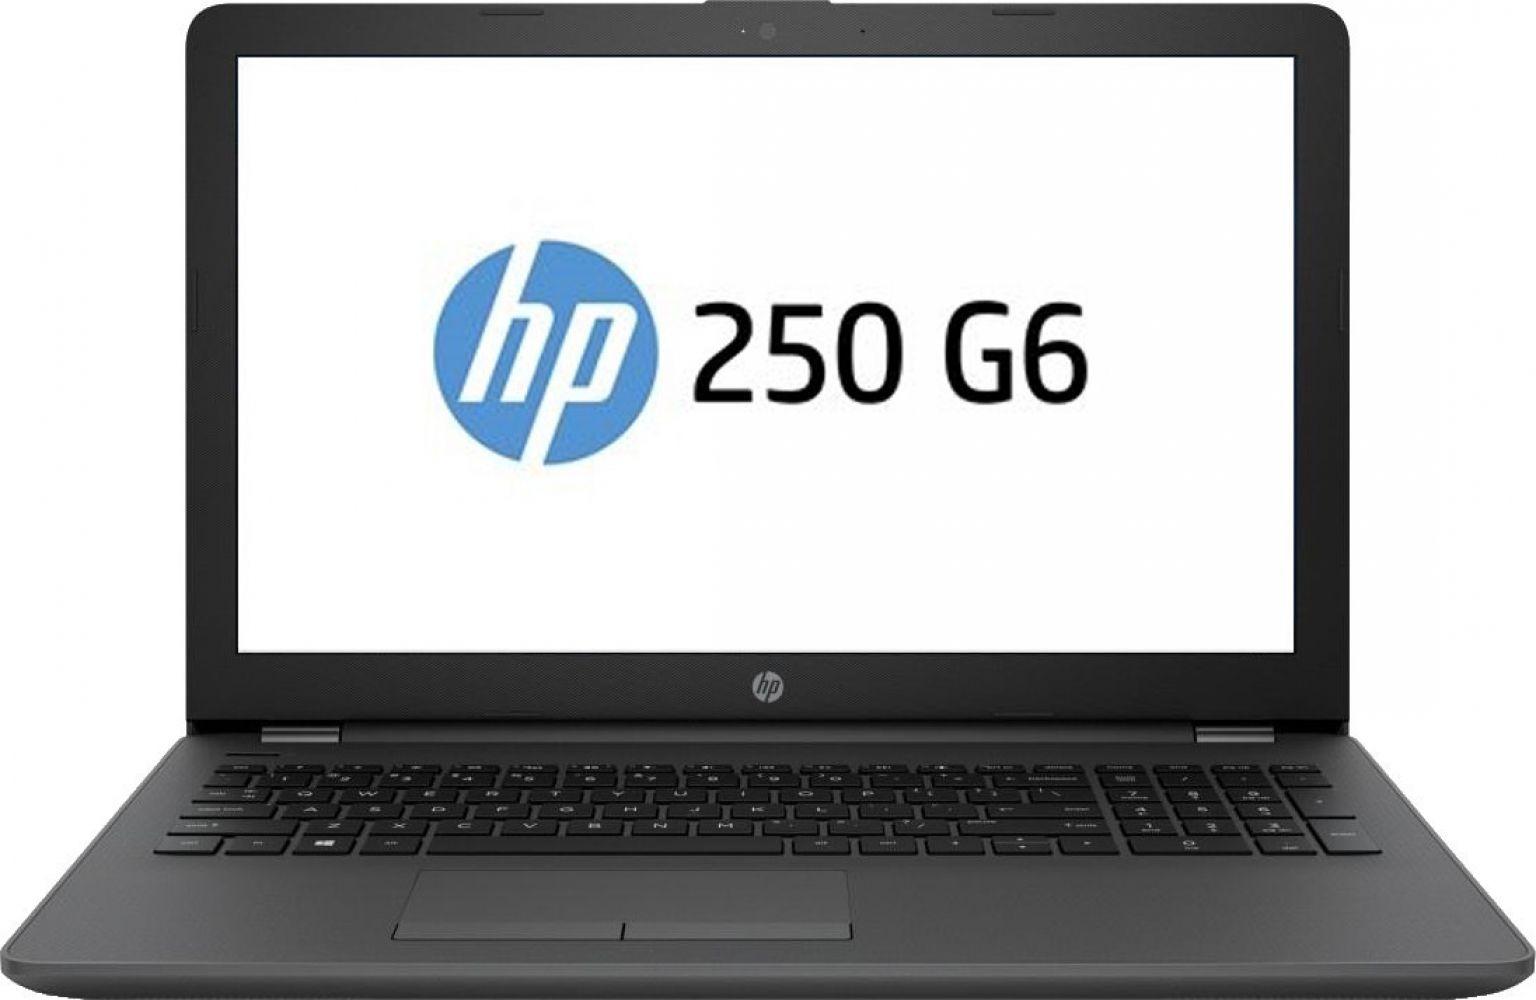 Купить Ноутбуки, Ноутбук HP 250 G6 (4LT10EA) Dark Ash, Hewlett Packard